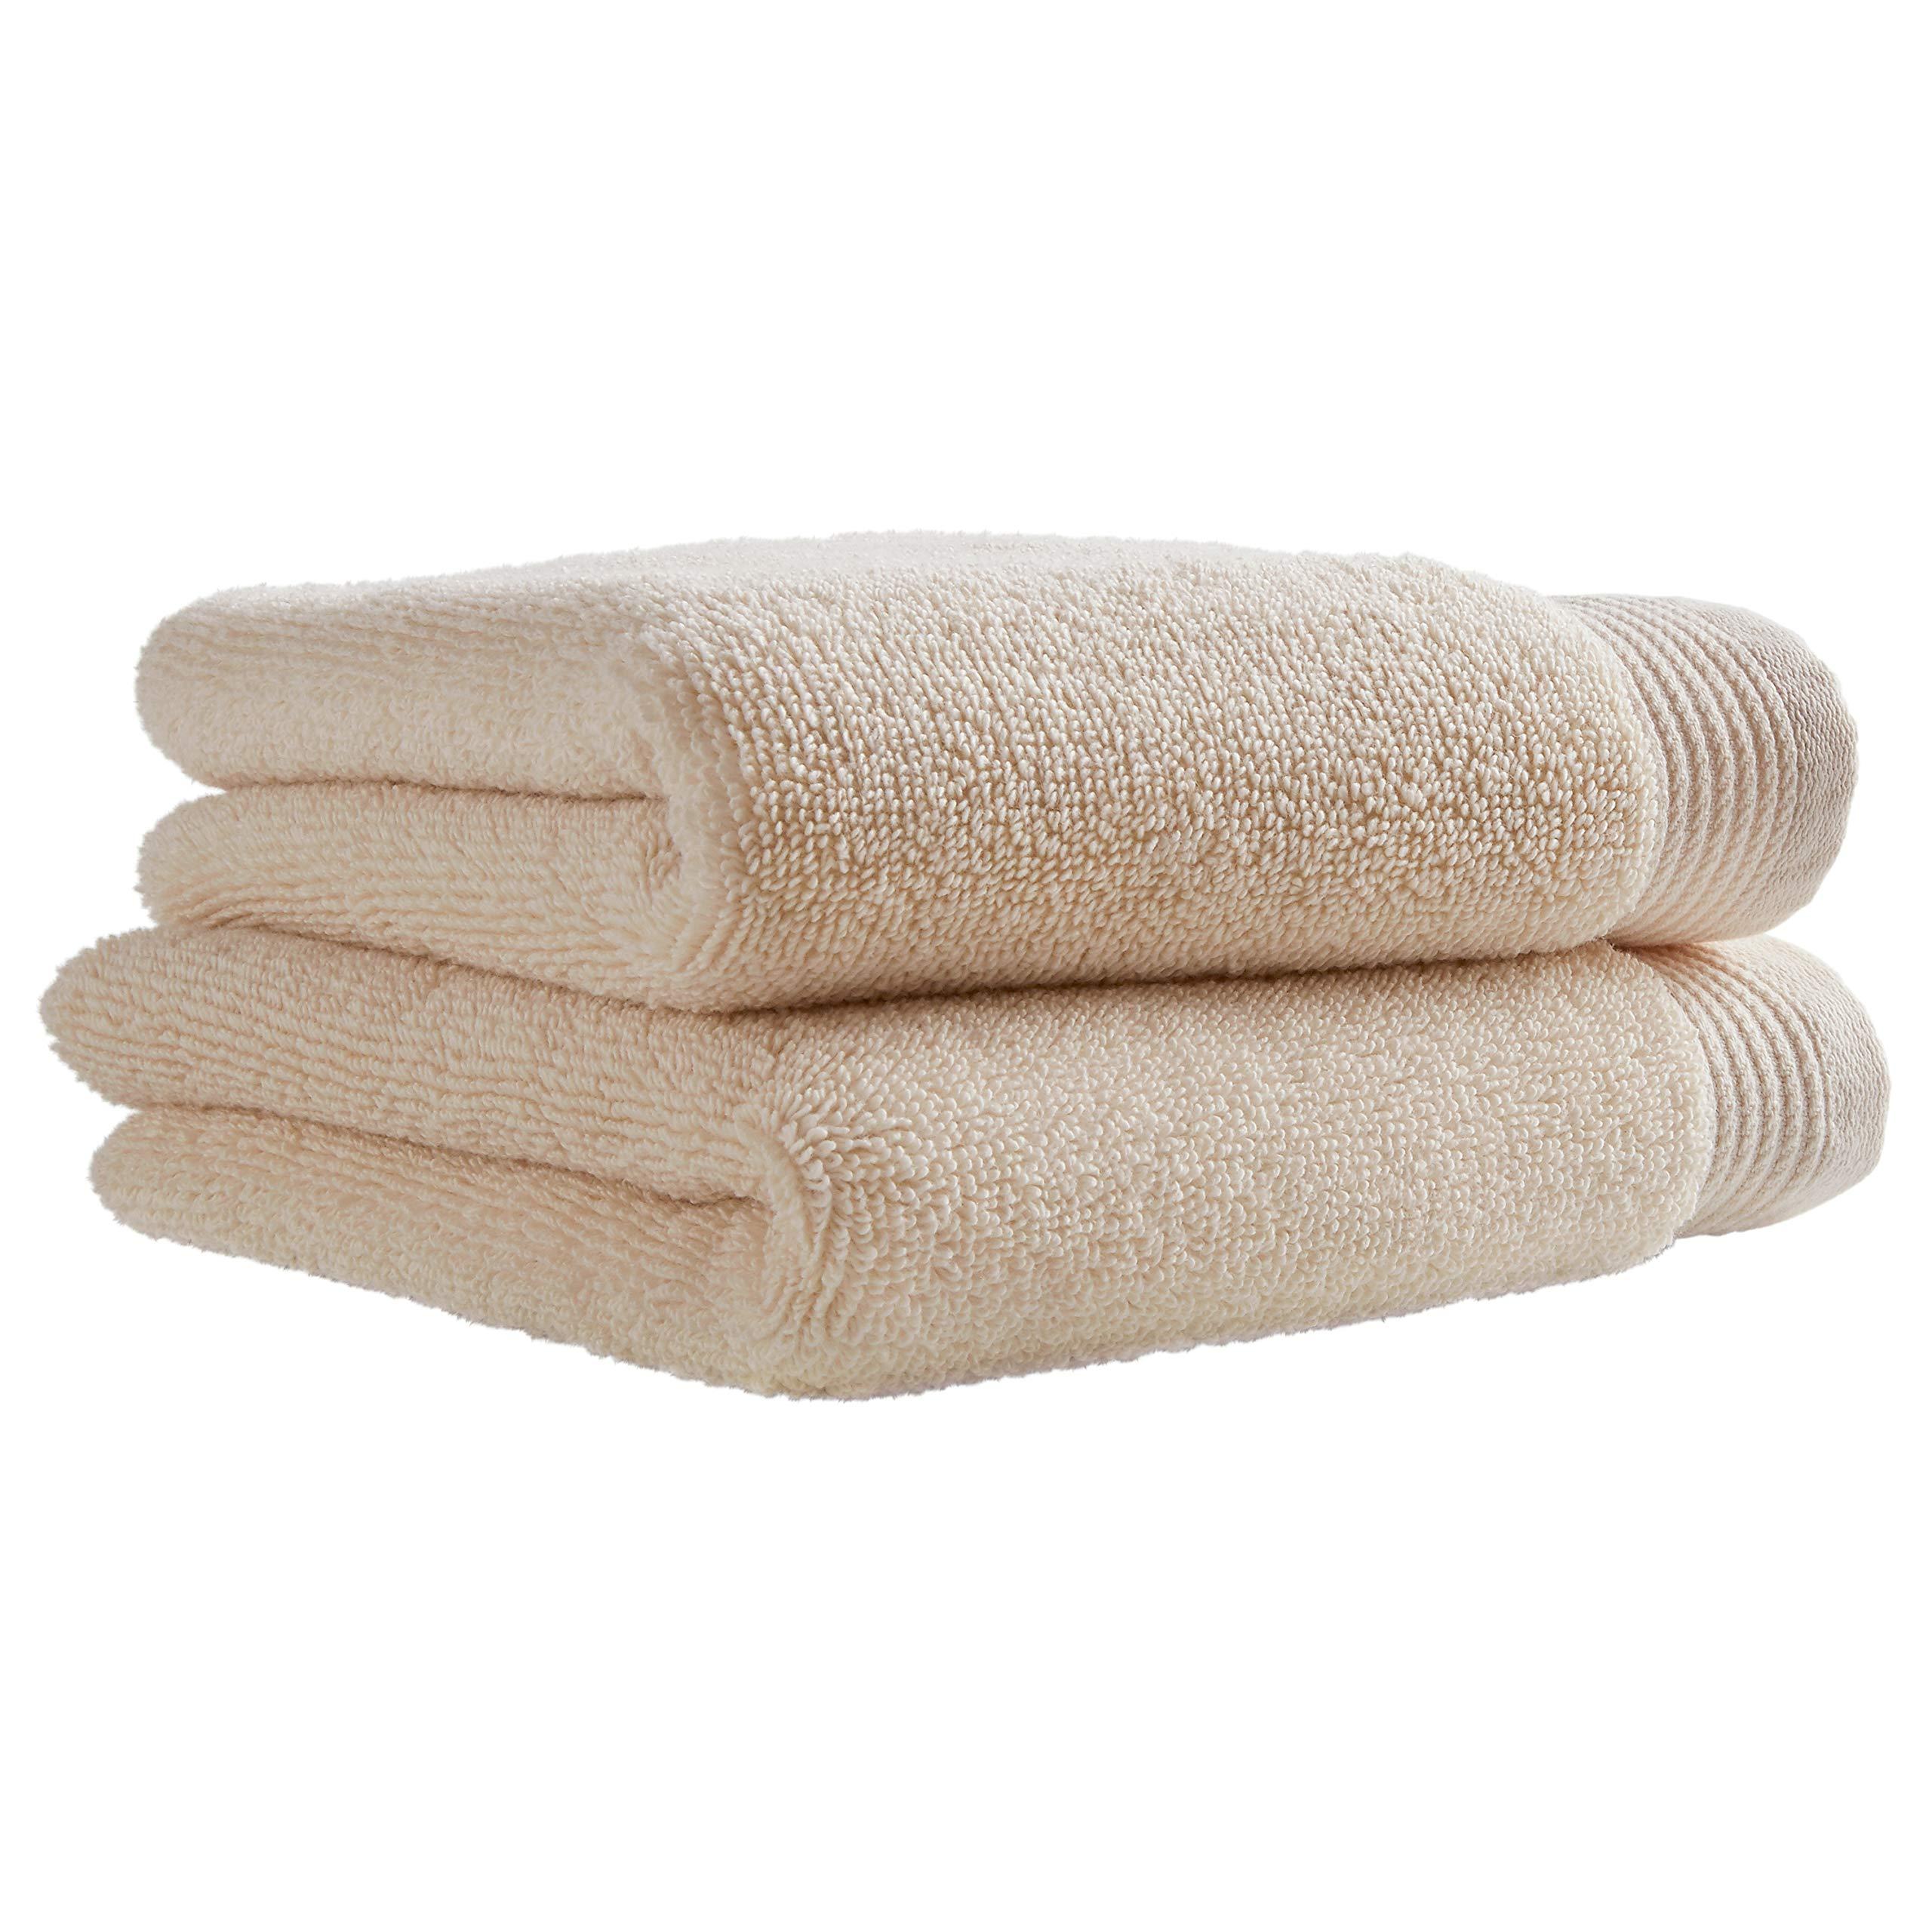 Amazon Brand – Stone & Beam Organic Cotton Hand Towel Set, Set of 2, Ivory